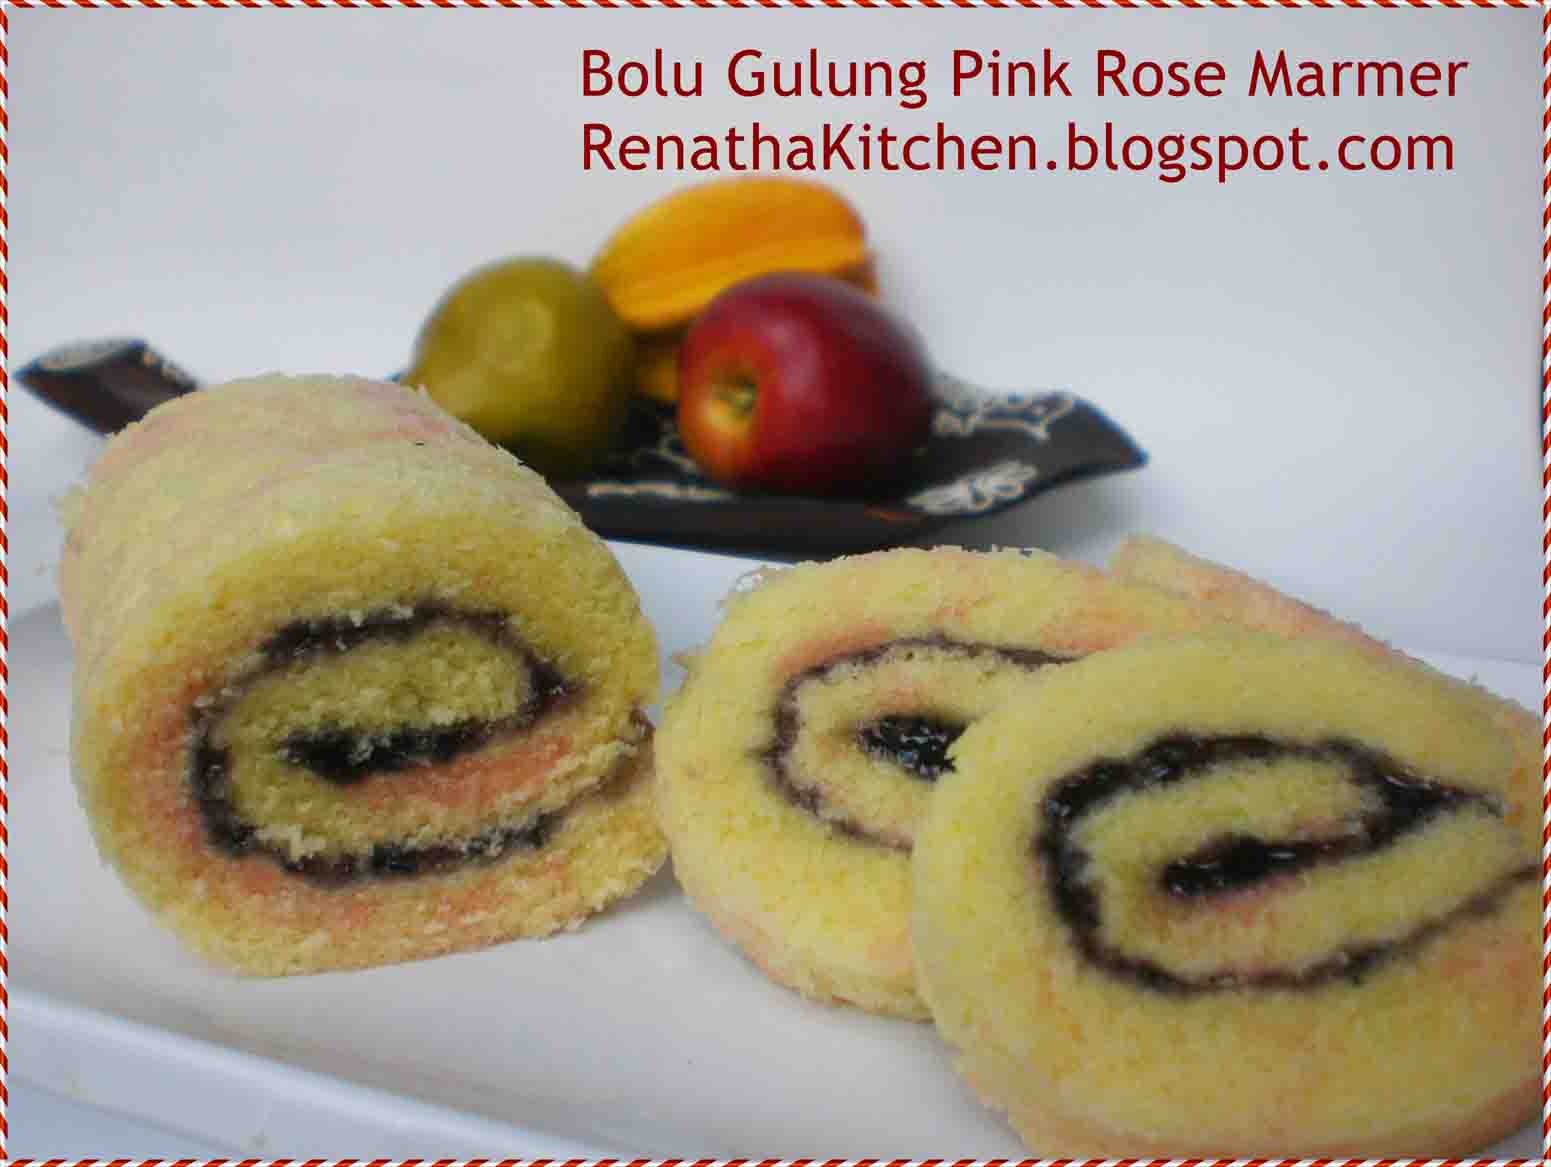 Resep Cake Pisang Ncc Fatmah Bahalwan: NCC Bolgul Week: Bolu Gulung Pink Rose Marmer By Rika